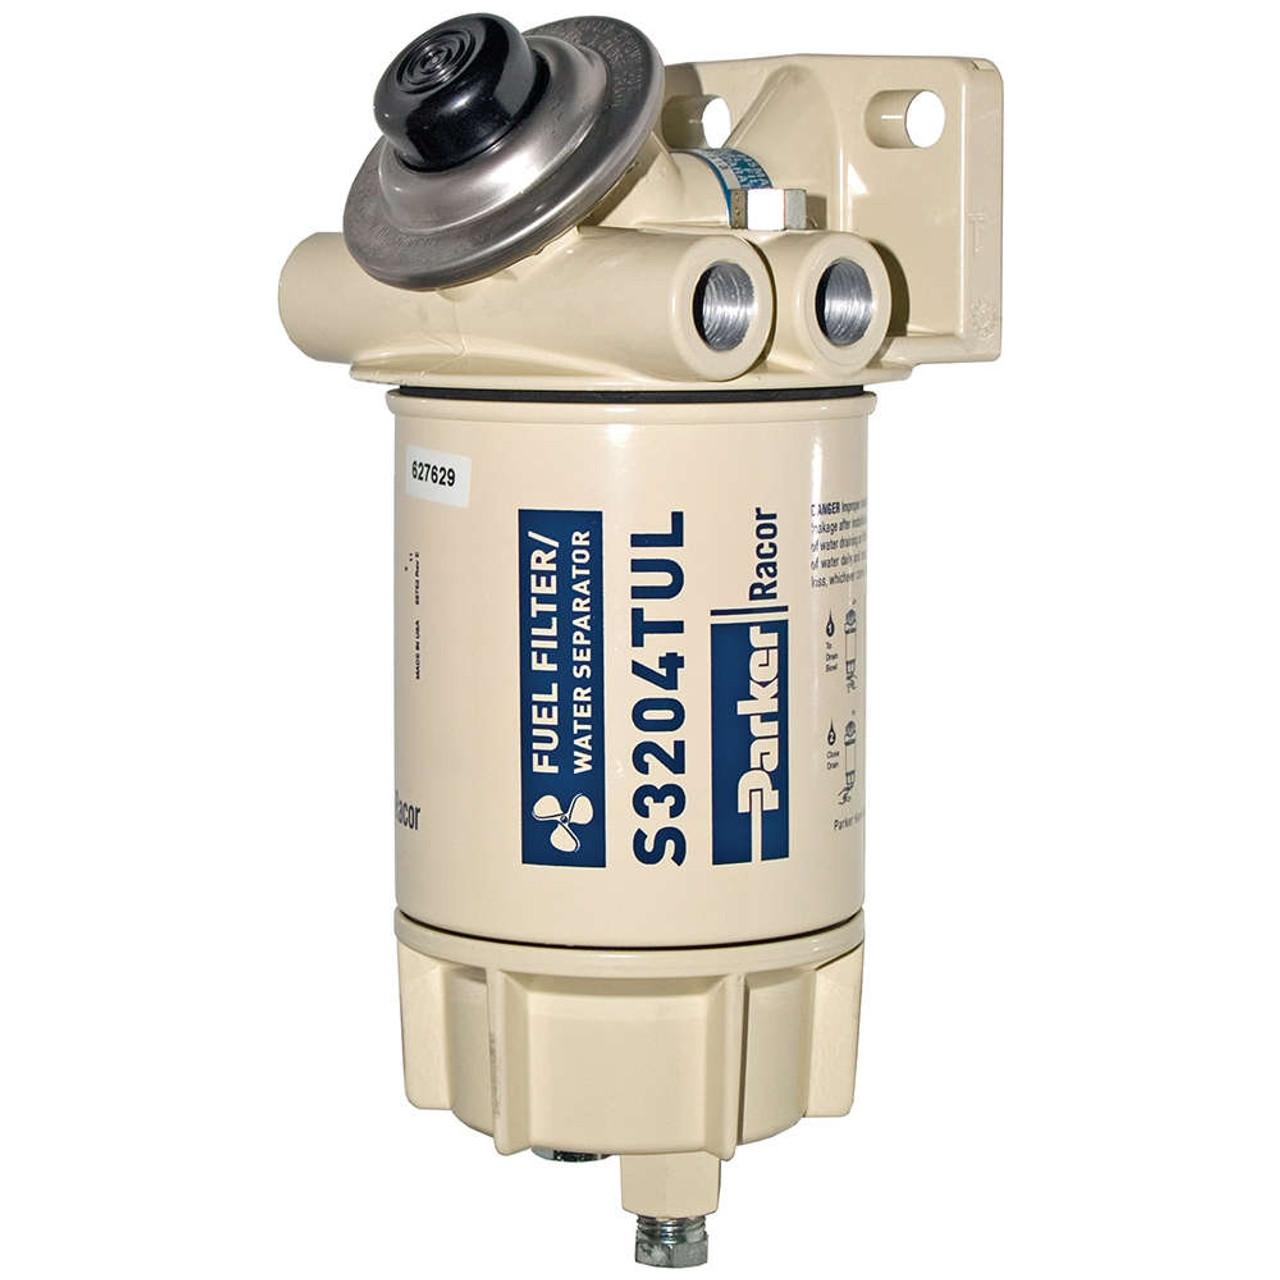 racor aquabloc marine 3 8 in 45 gph spin on diesel fuel filter mix racor aquabloc [ 1280 x 1280 Pixel ]